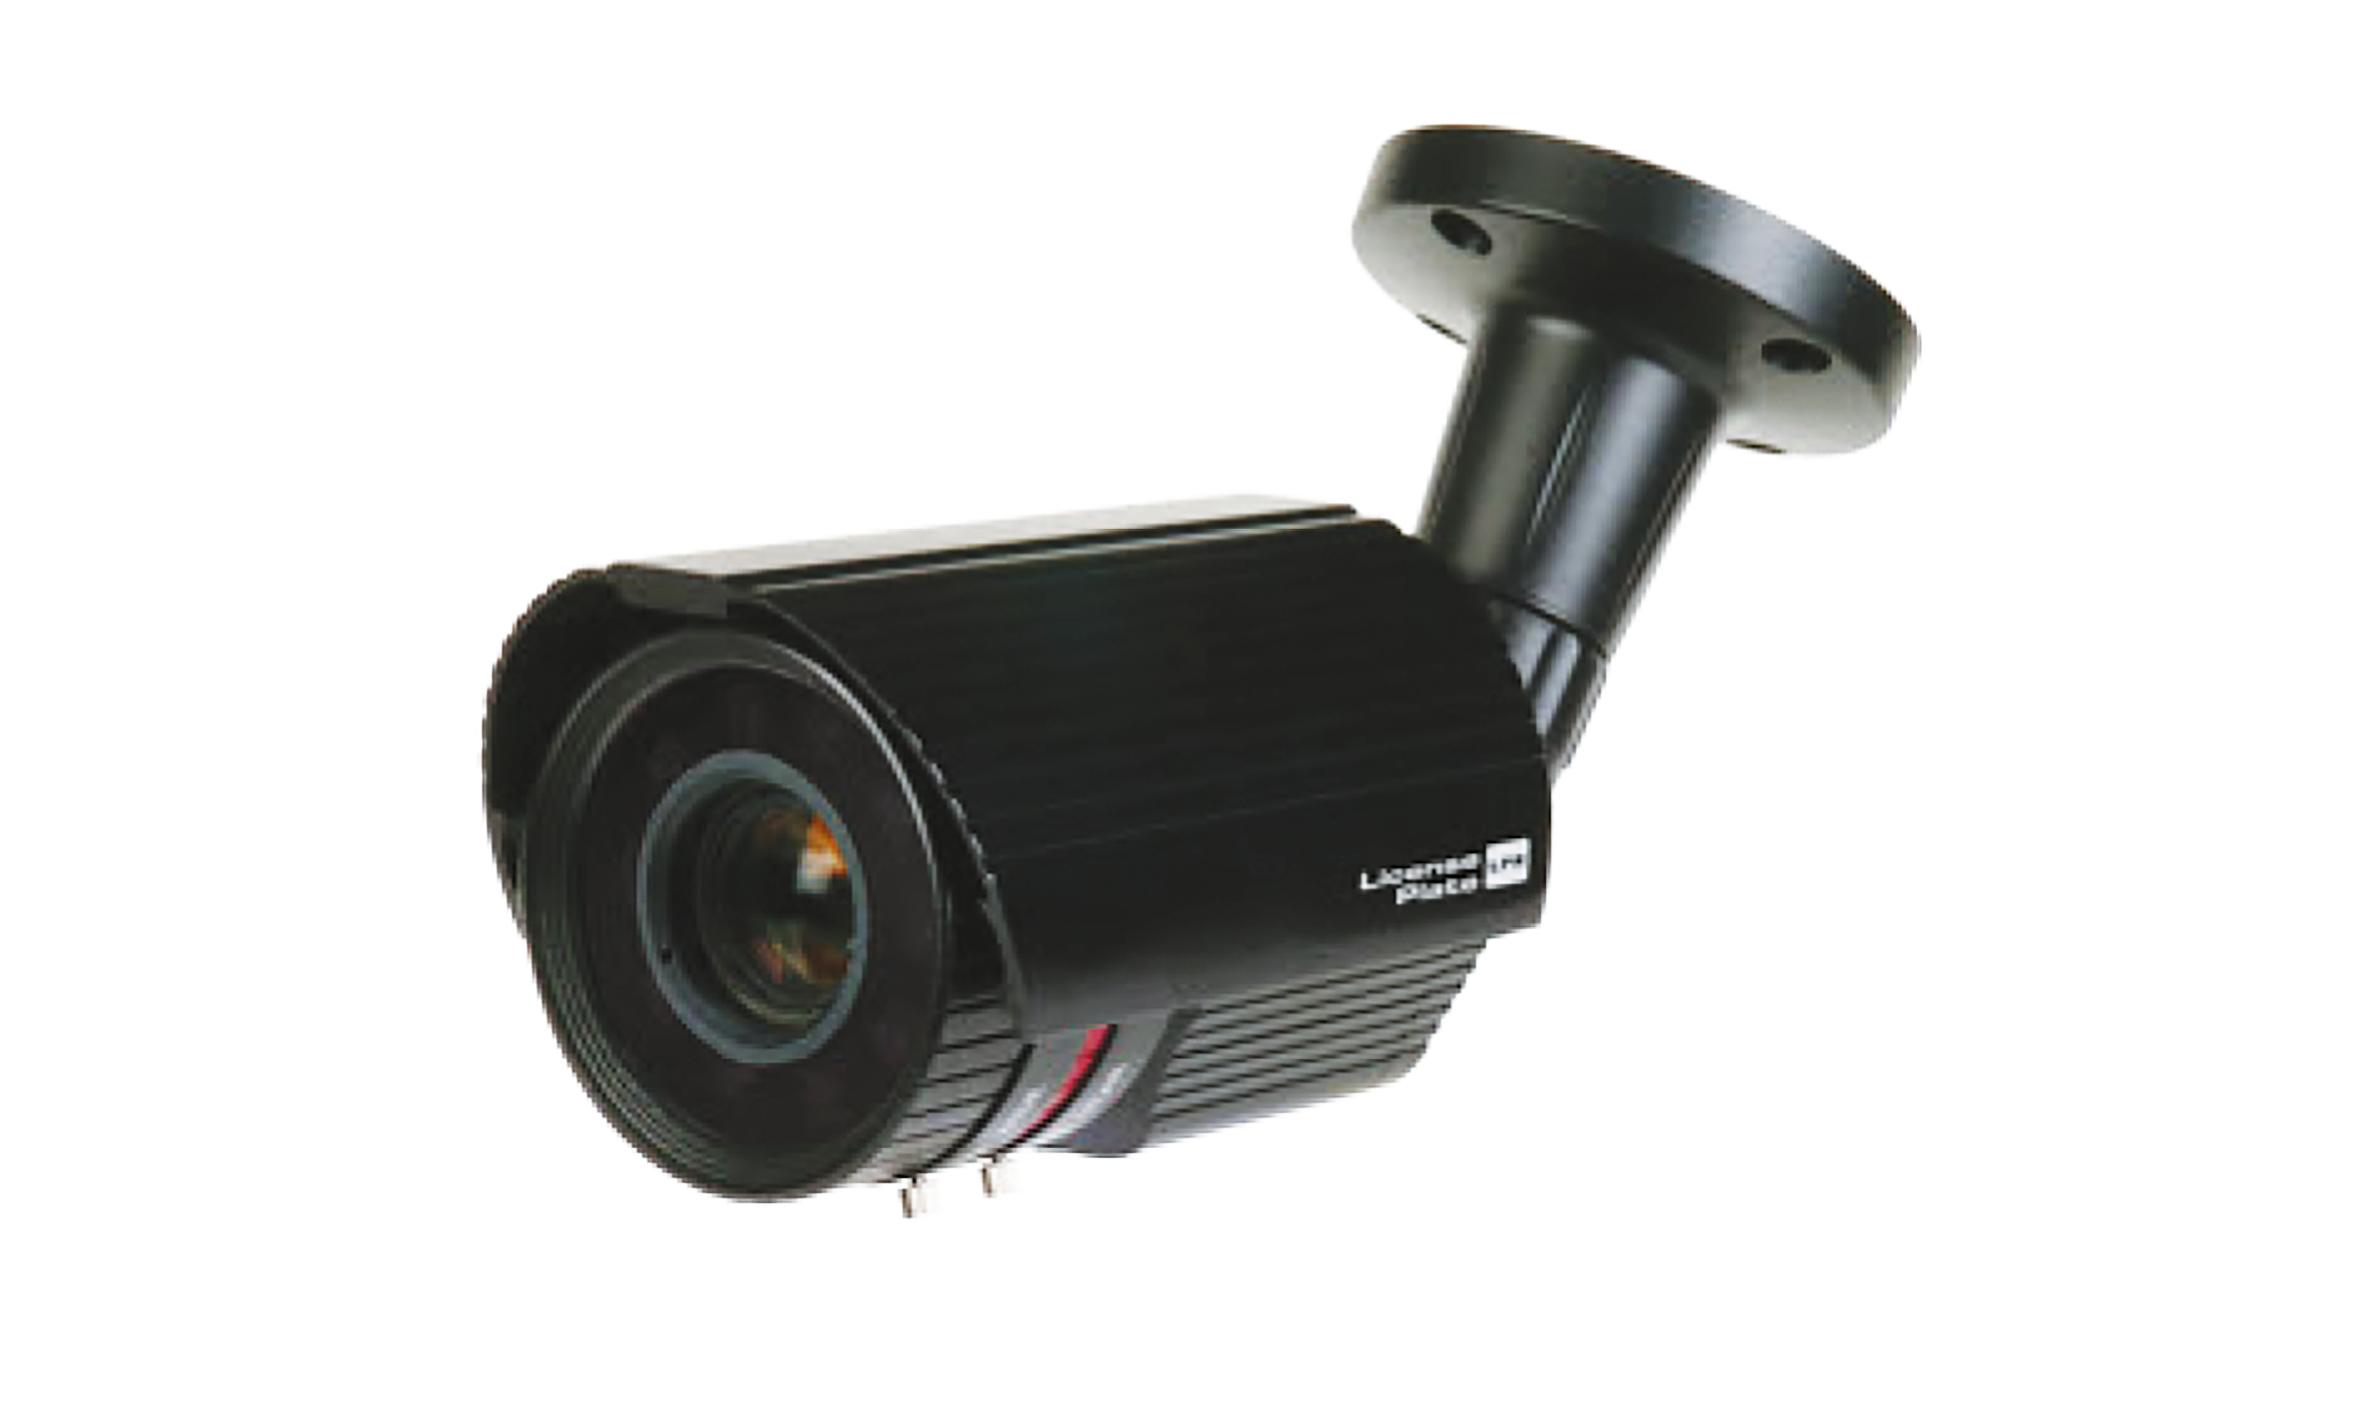 License Plate Camera